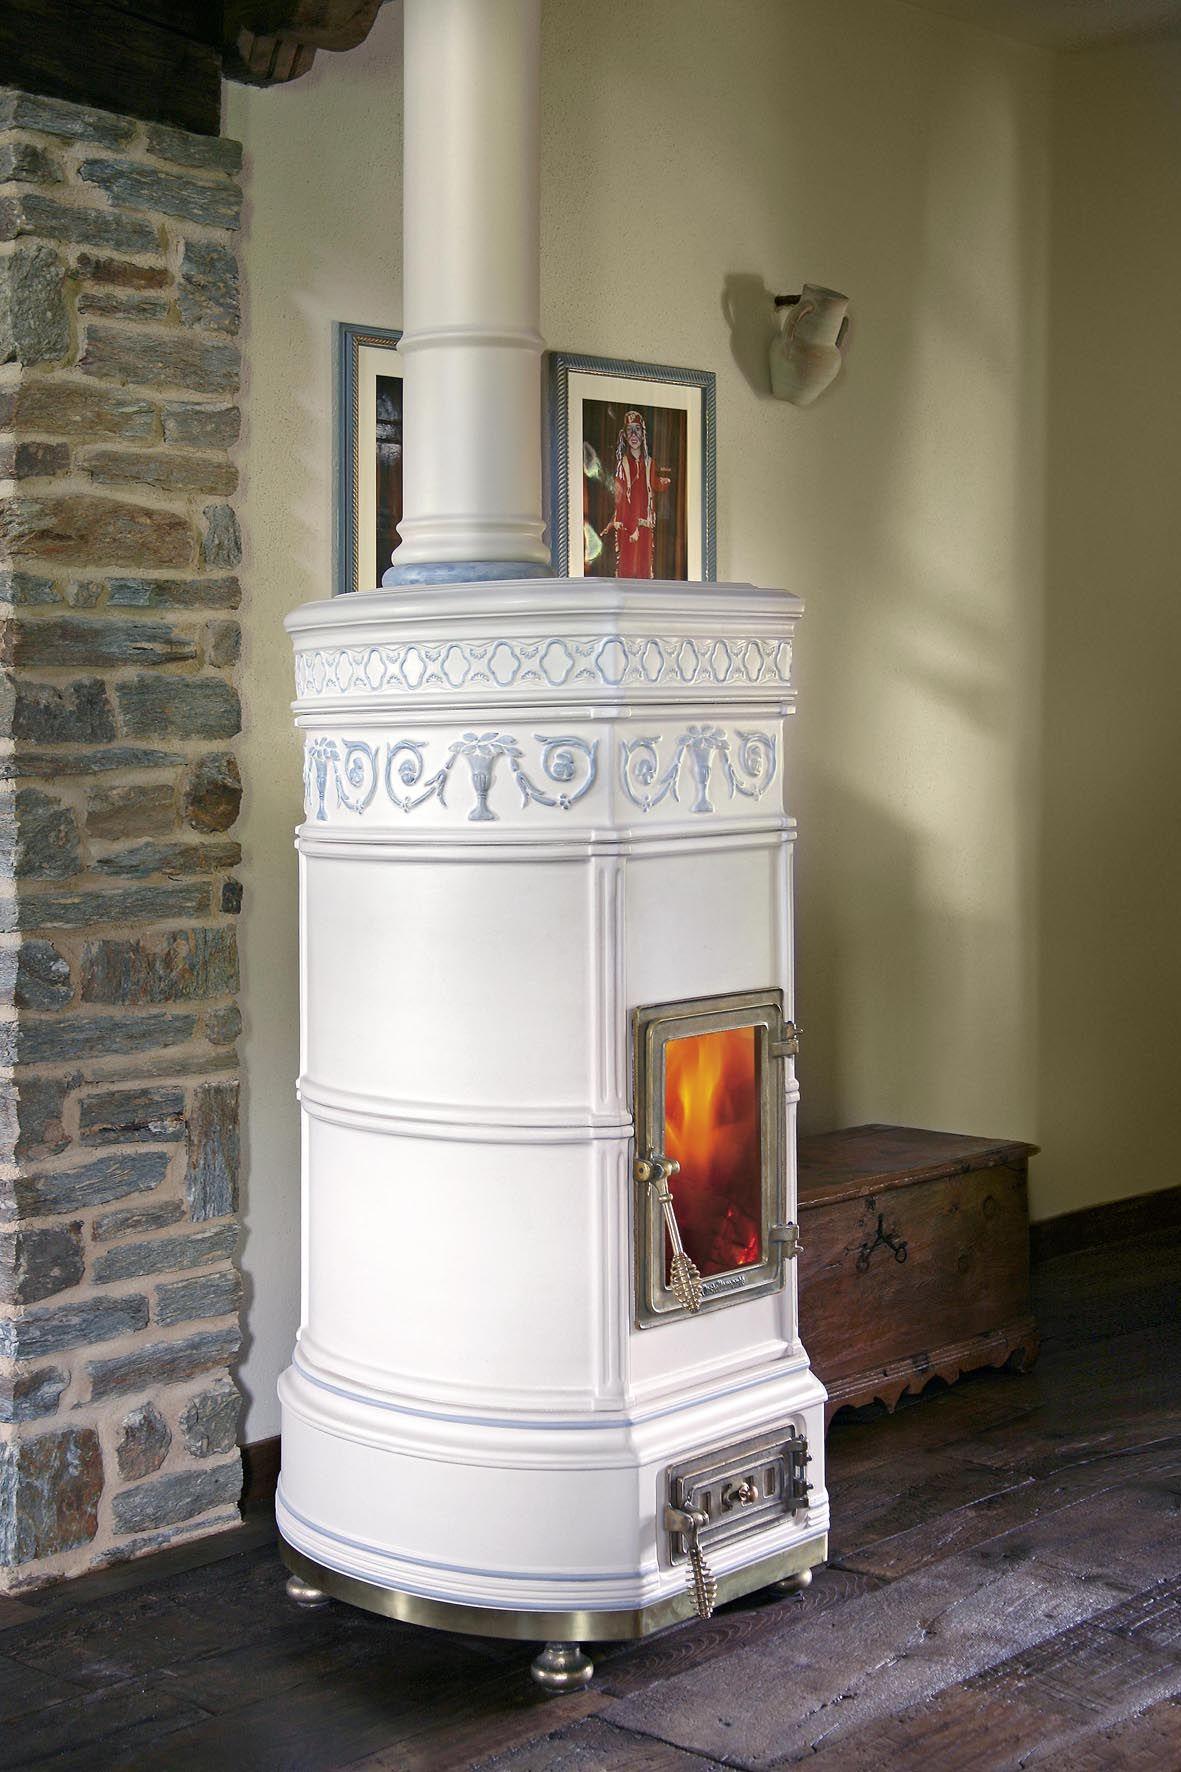 grand'ovale 2nd size - hand decorated   cheminée et poêle